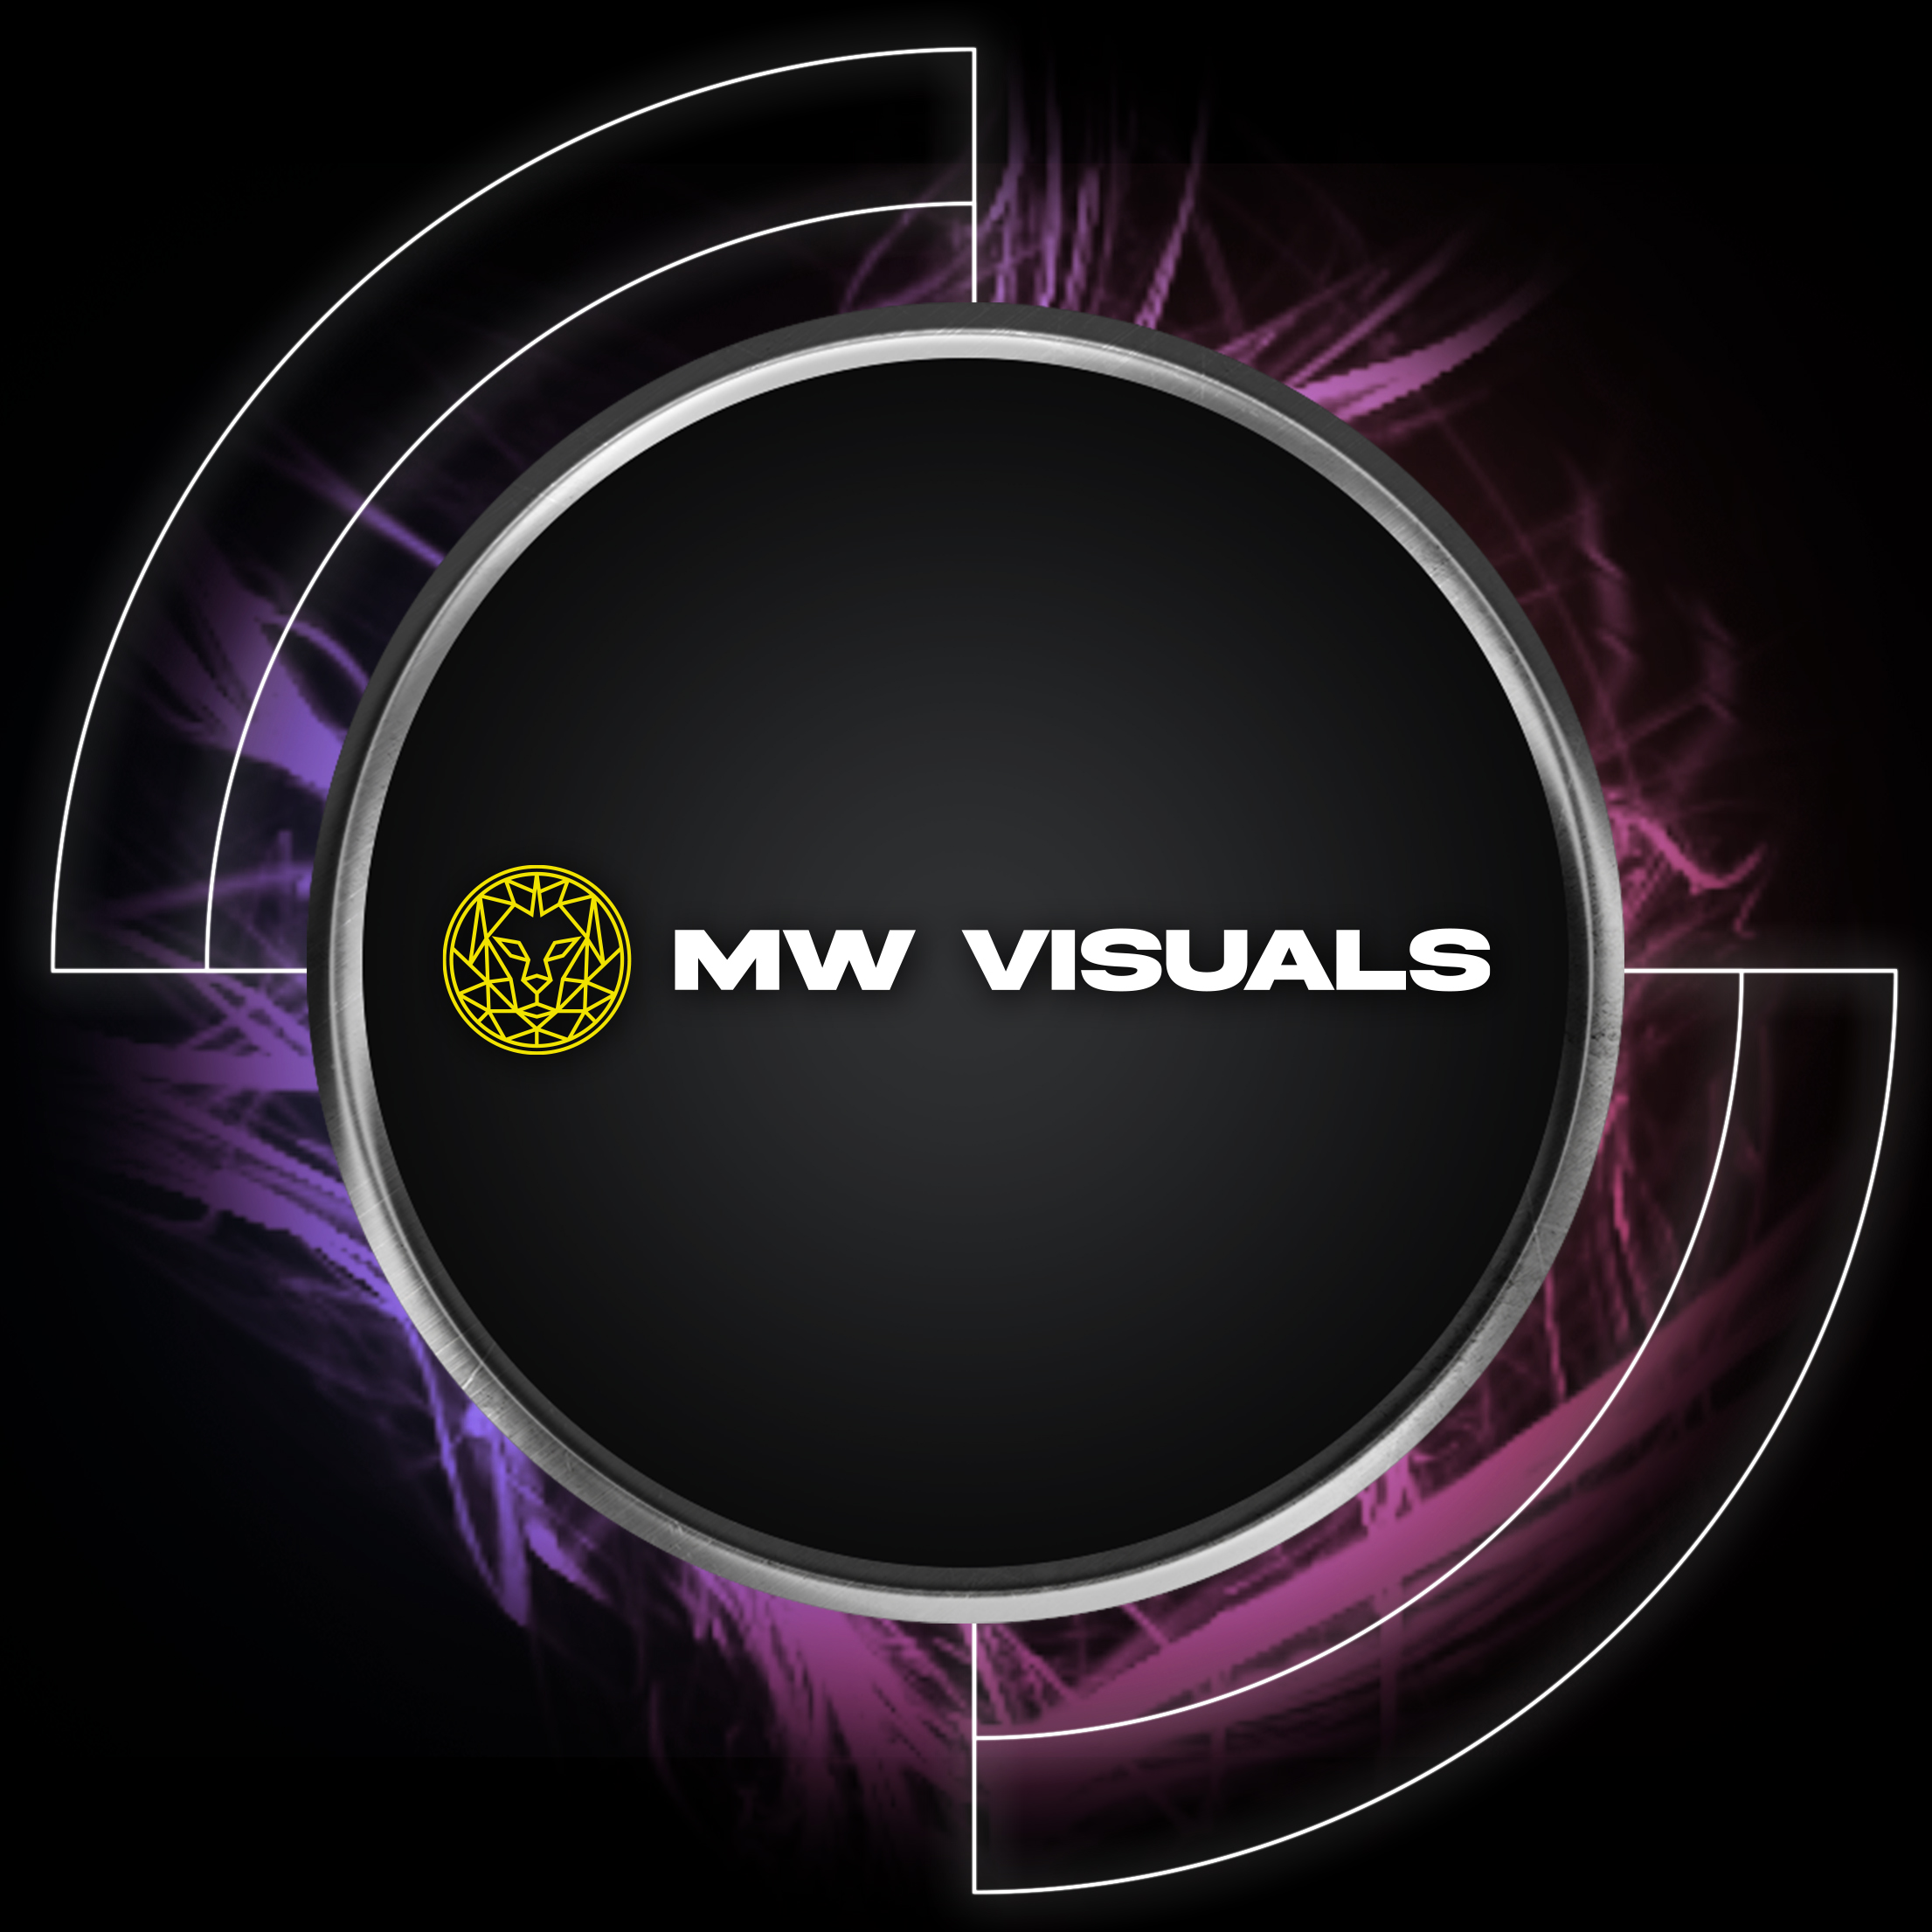 MW Visuals